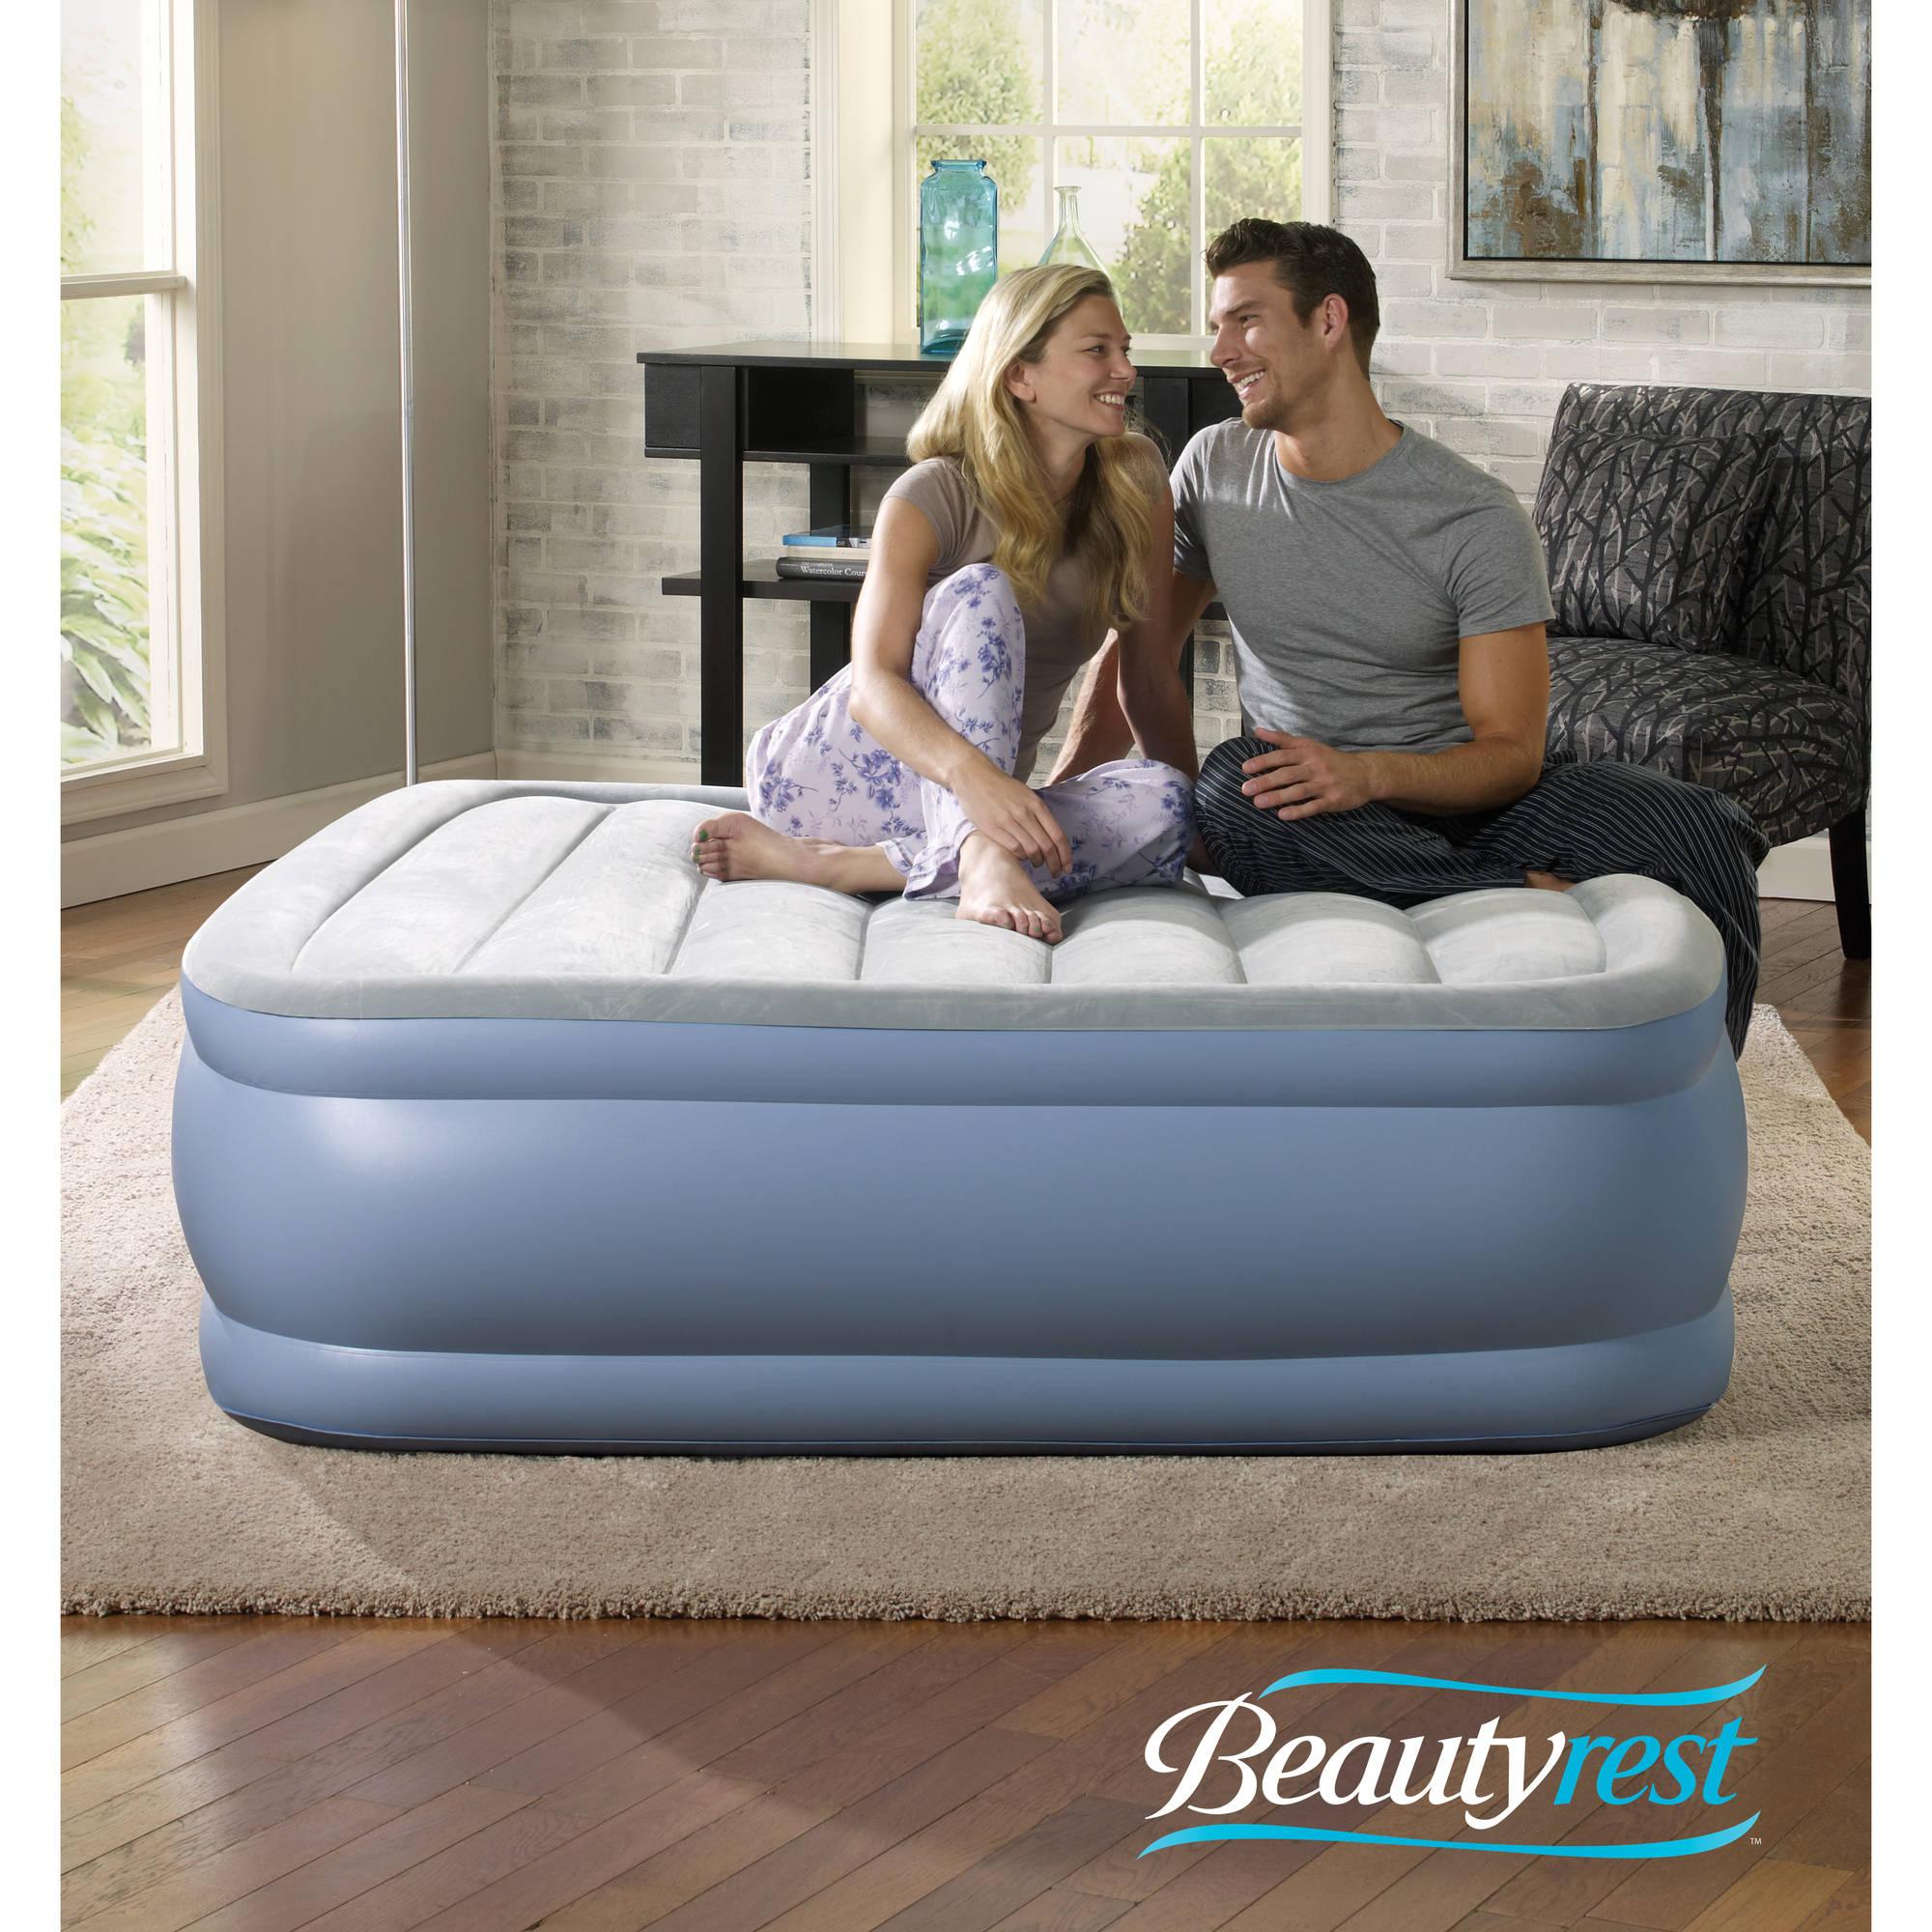 Simmons Beautyrest Hi Loft Raised Air Bed Mattress with Express Pump, Multiple Sizes